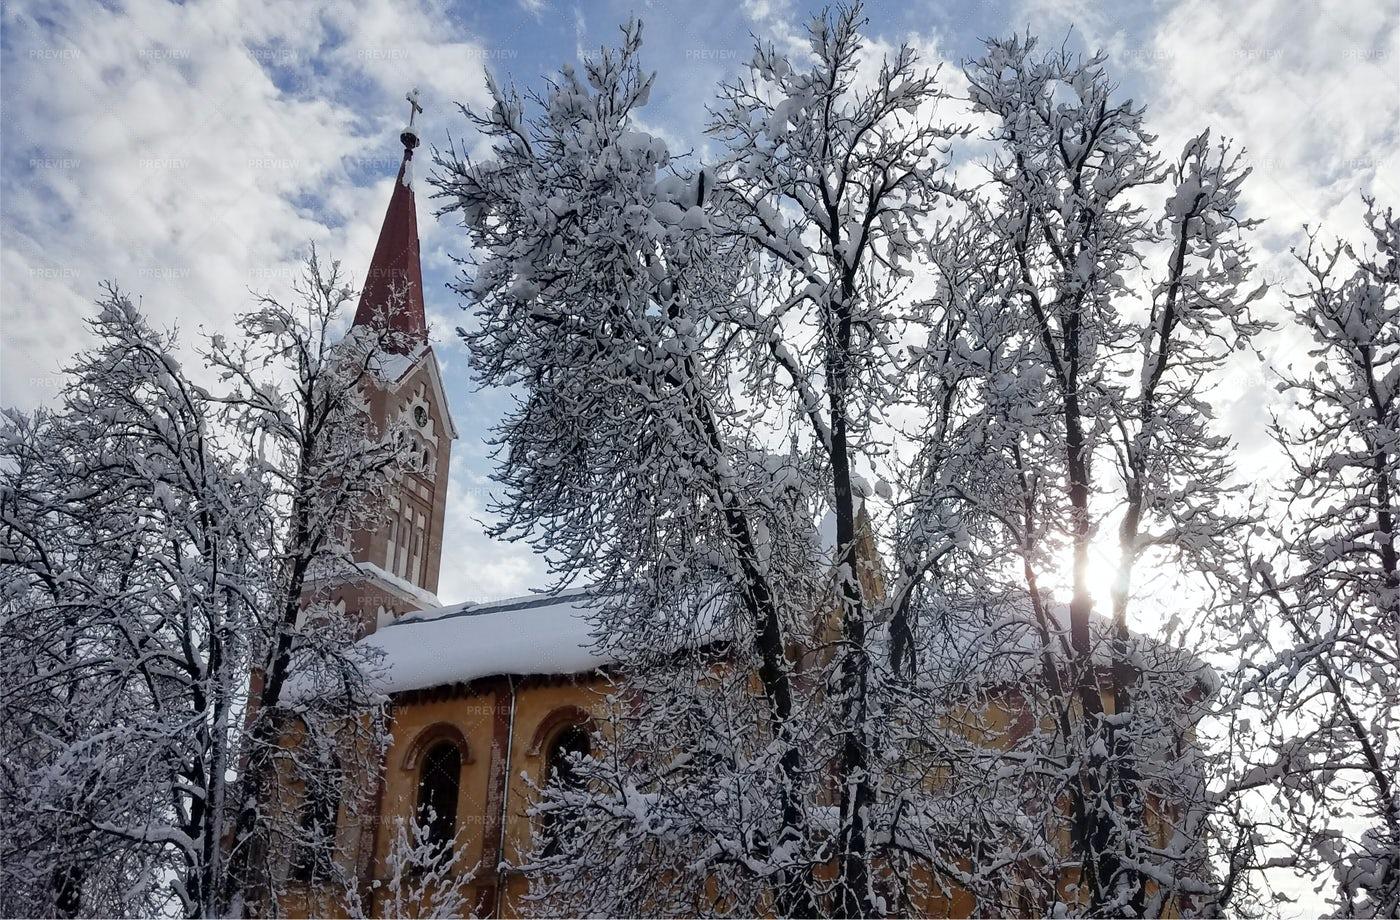 Church In Winter: Stock Photos